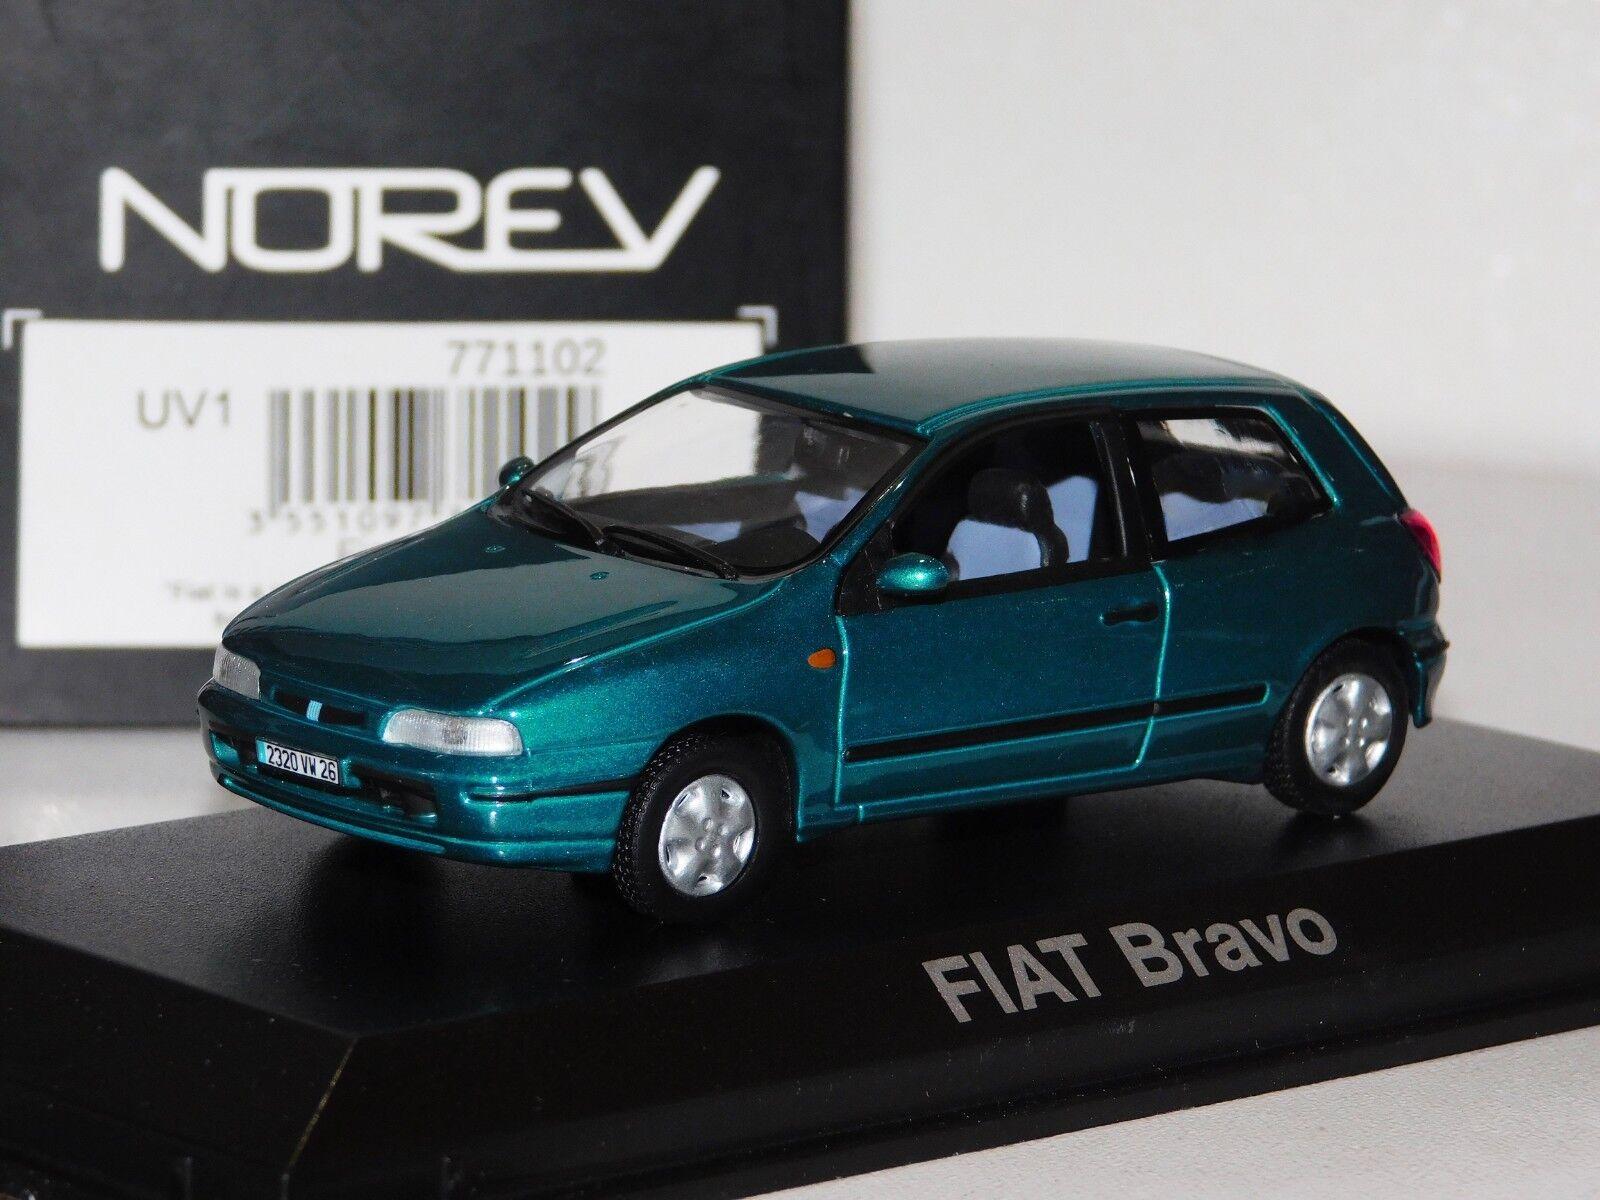 FIAT FIAT FIAT BRAVO NOREV 771102 1 43 3795c8